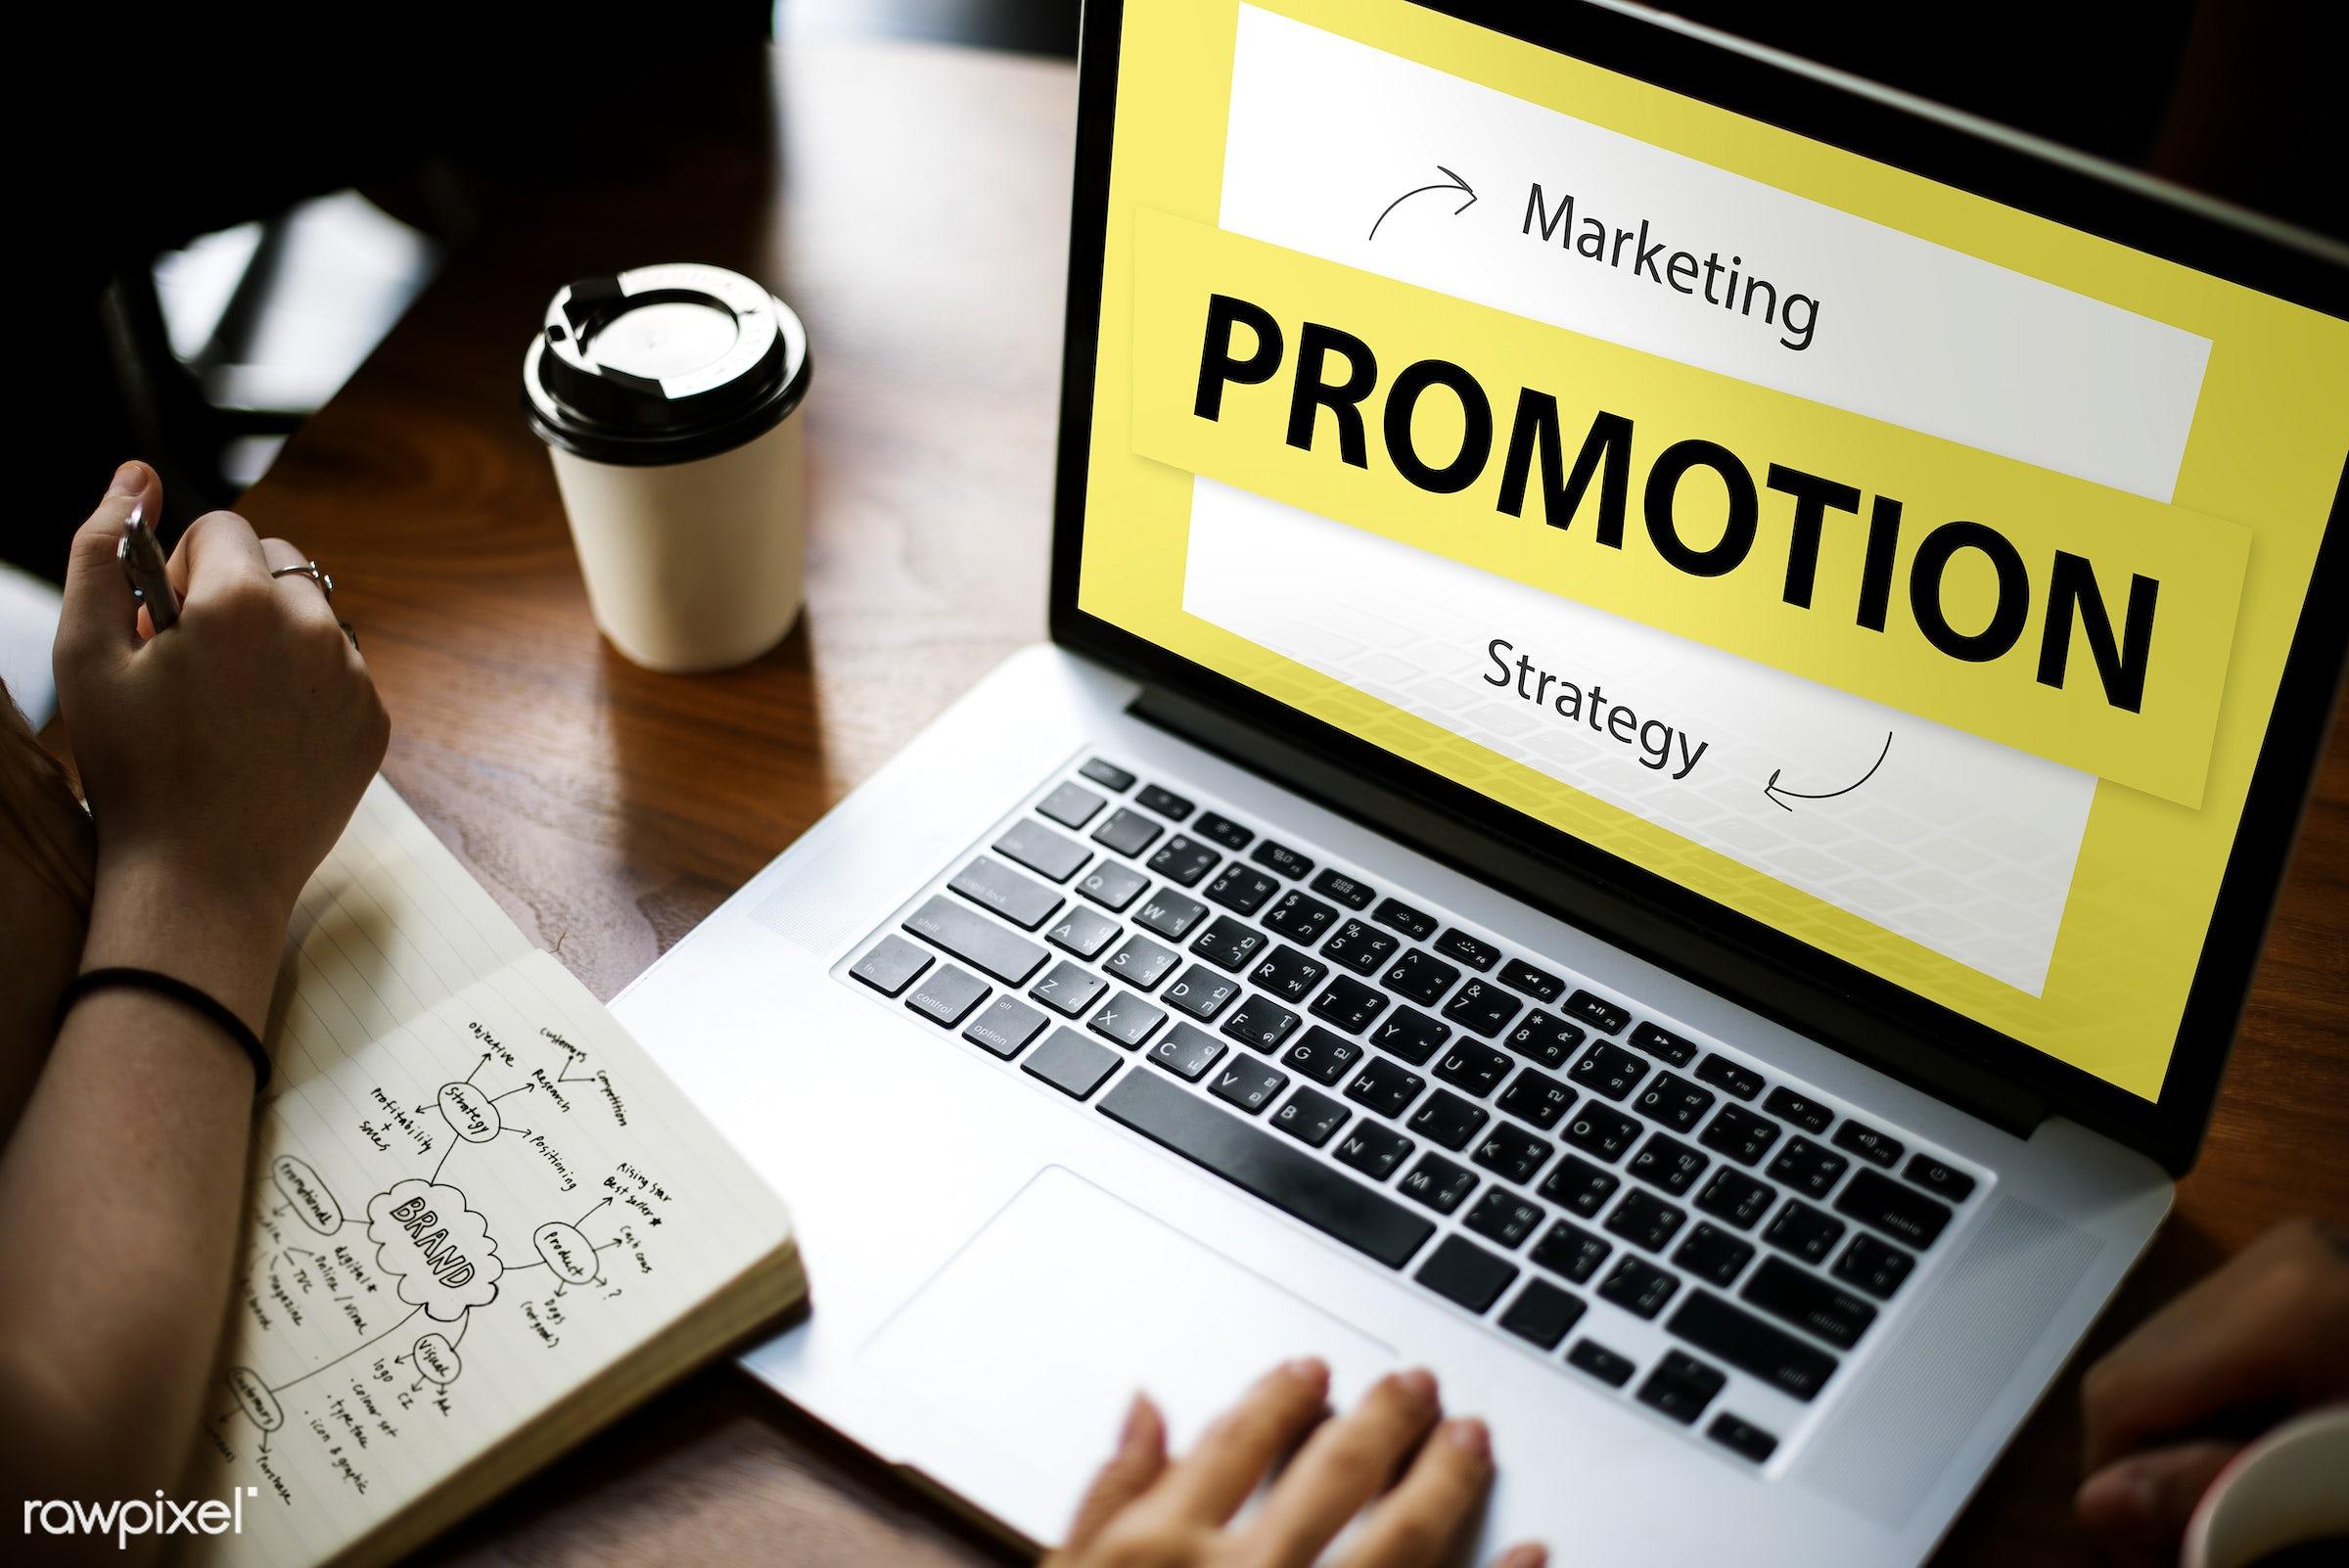 branding, advertising, analysis, assessment, brand, browsing, business, coffee cup, creativity, device, digital, digital...